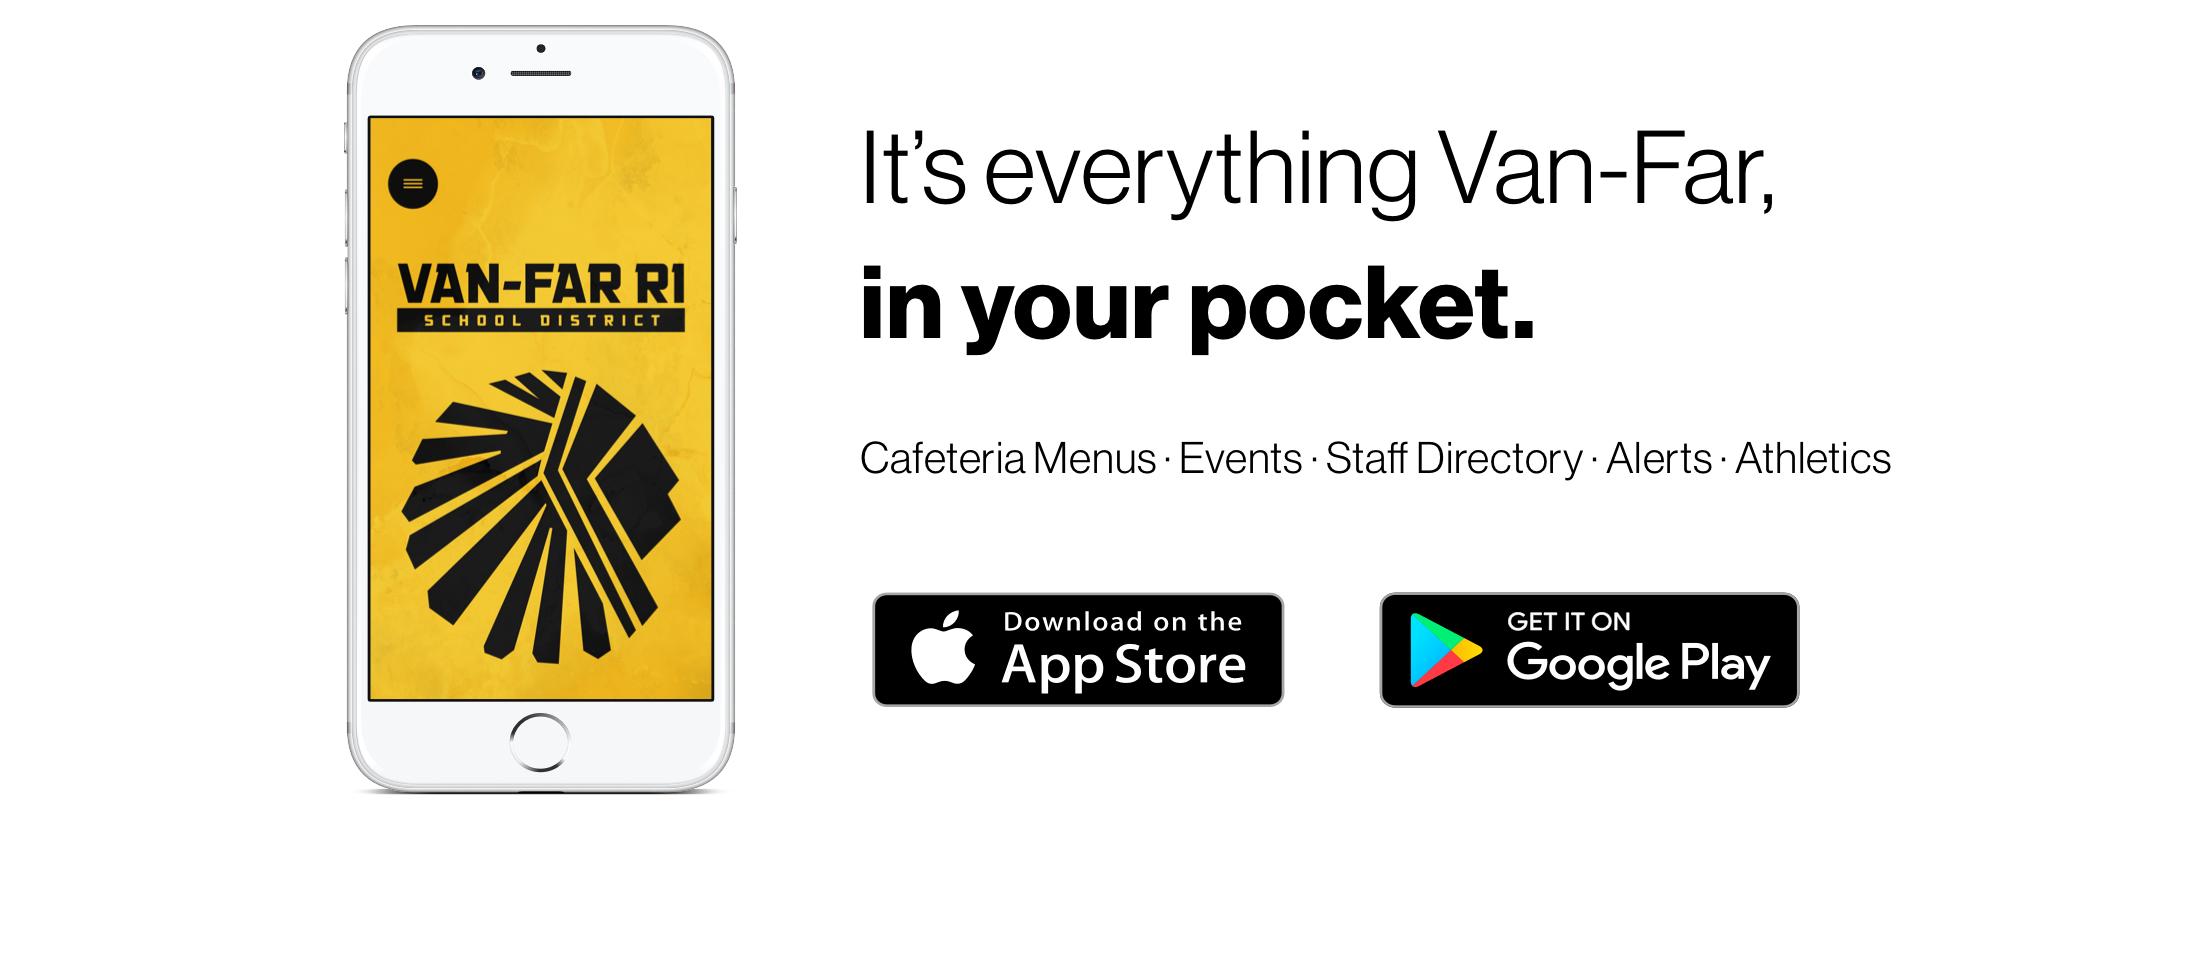 Download the Van-Far App